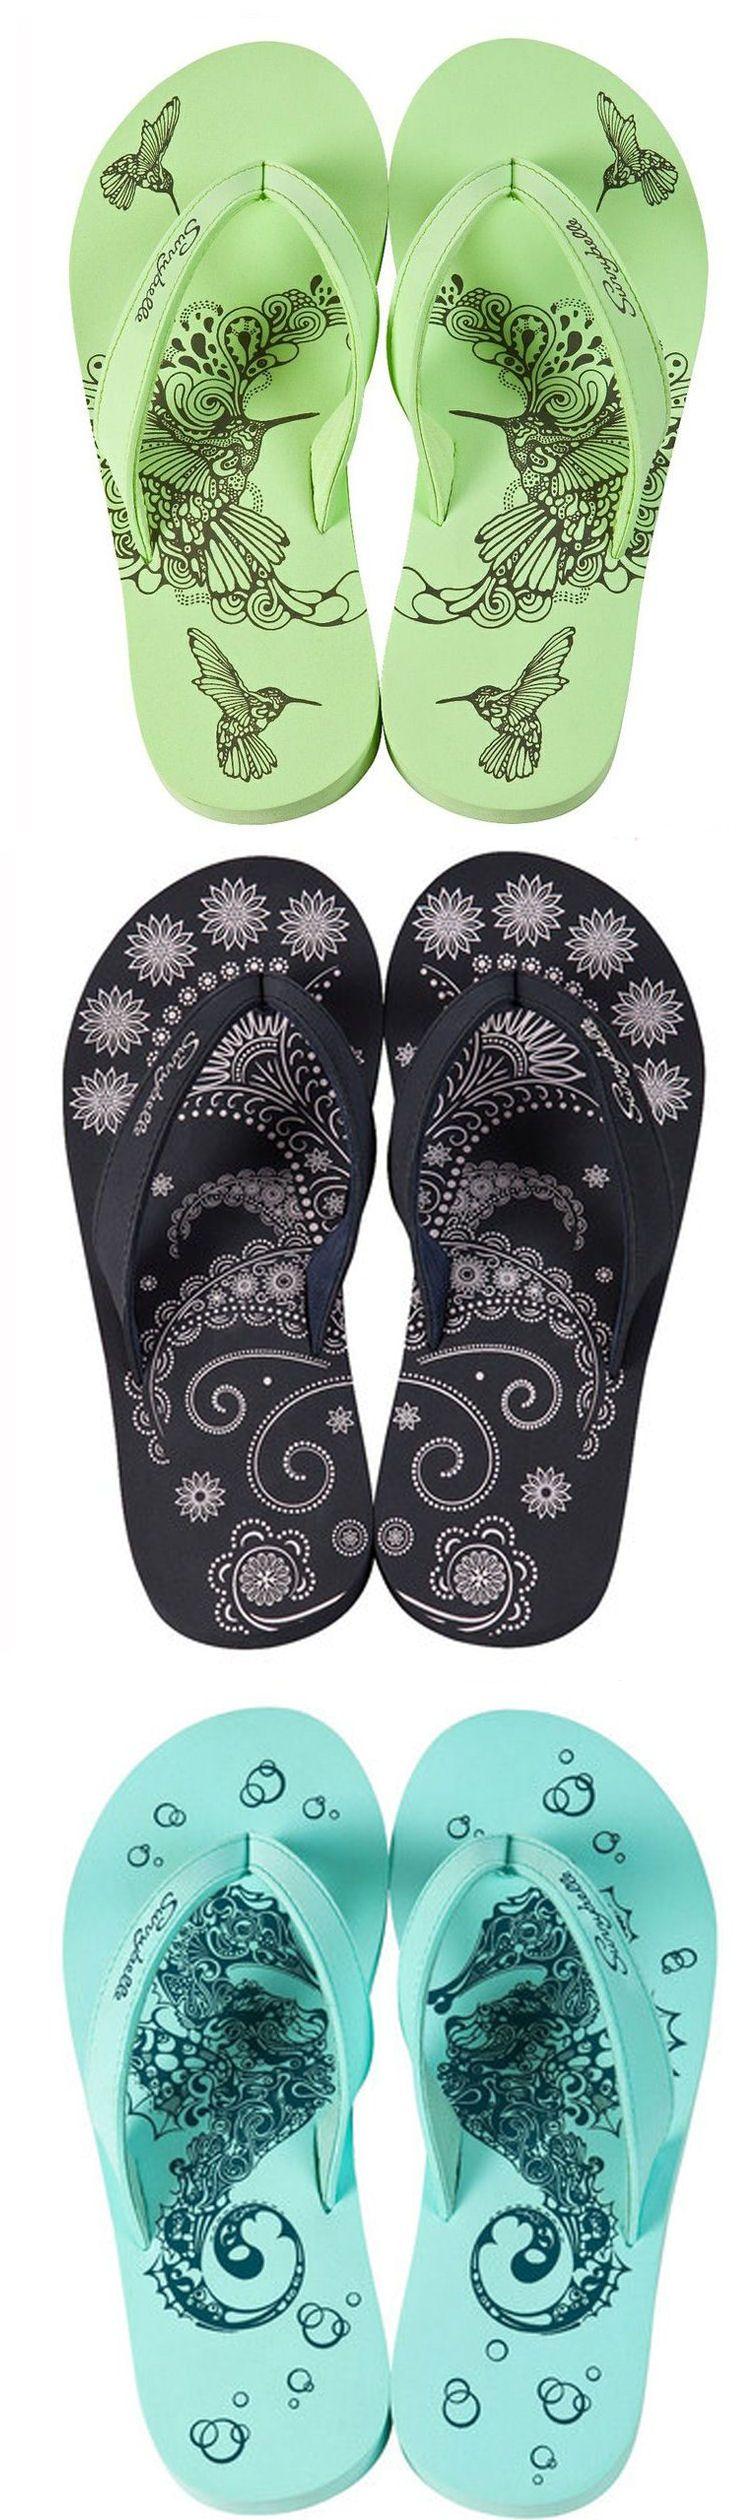 Sunnybelle Flip Flops ♡